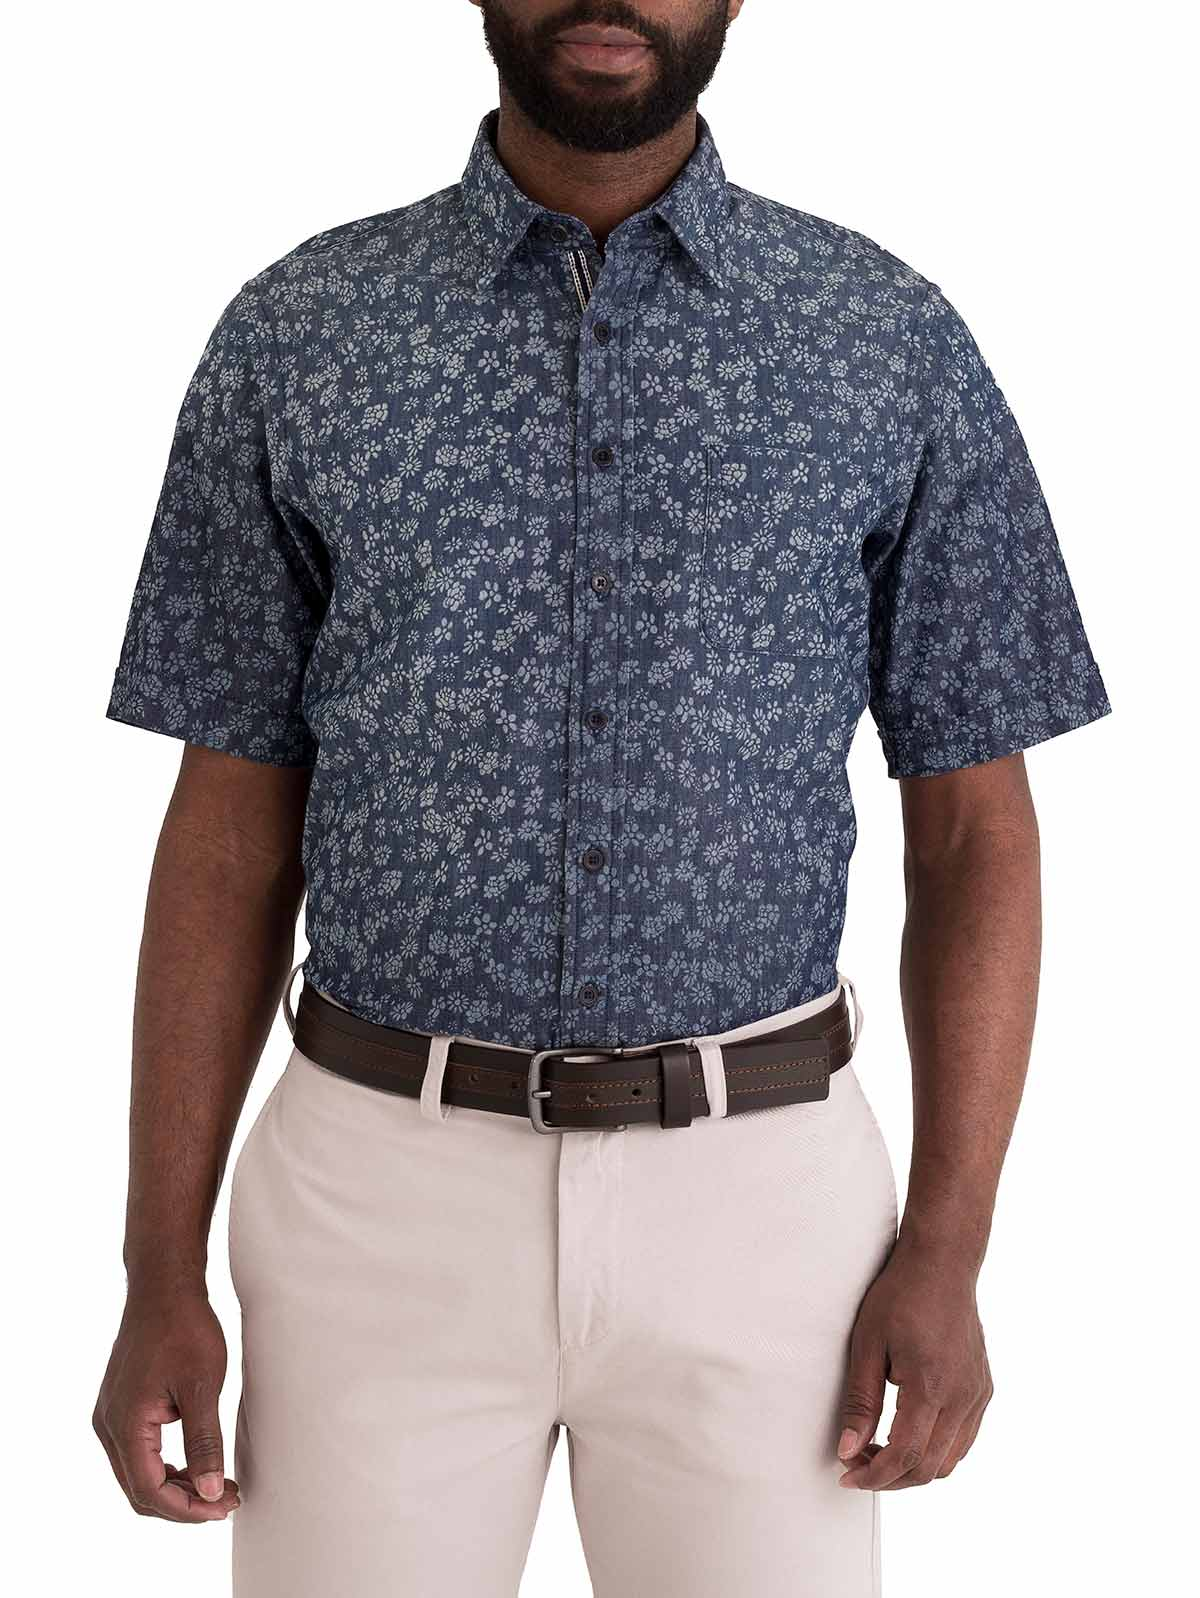 fcc543a20 Camisa Casual Regular Fit Manga Corta 82562 - Arturo Calle